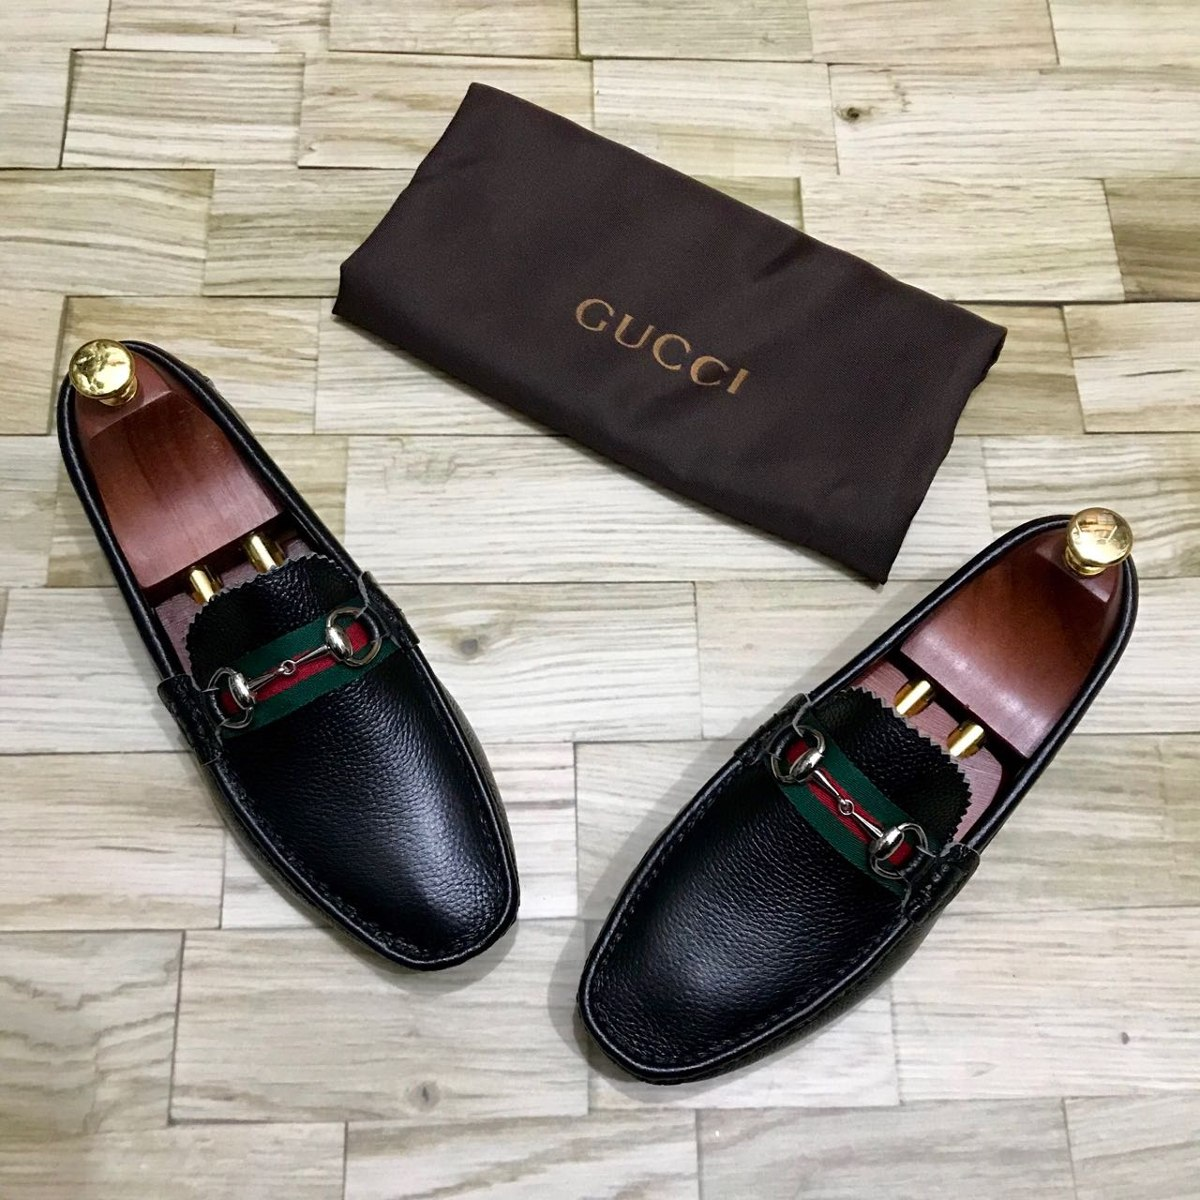 5040fc2a9e4a8 Zapatos Mocasines Gucci -   280.000 en Mercado Libre